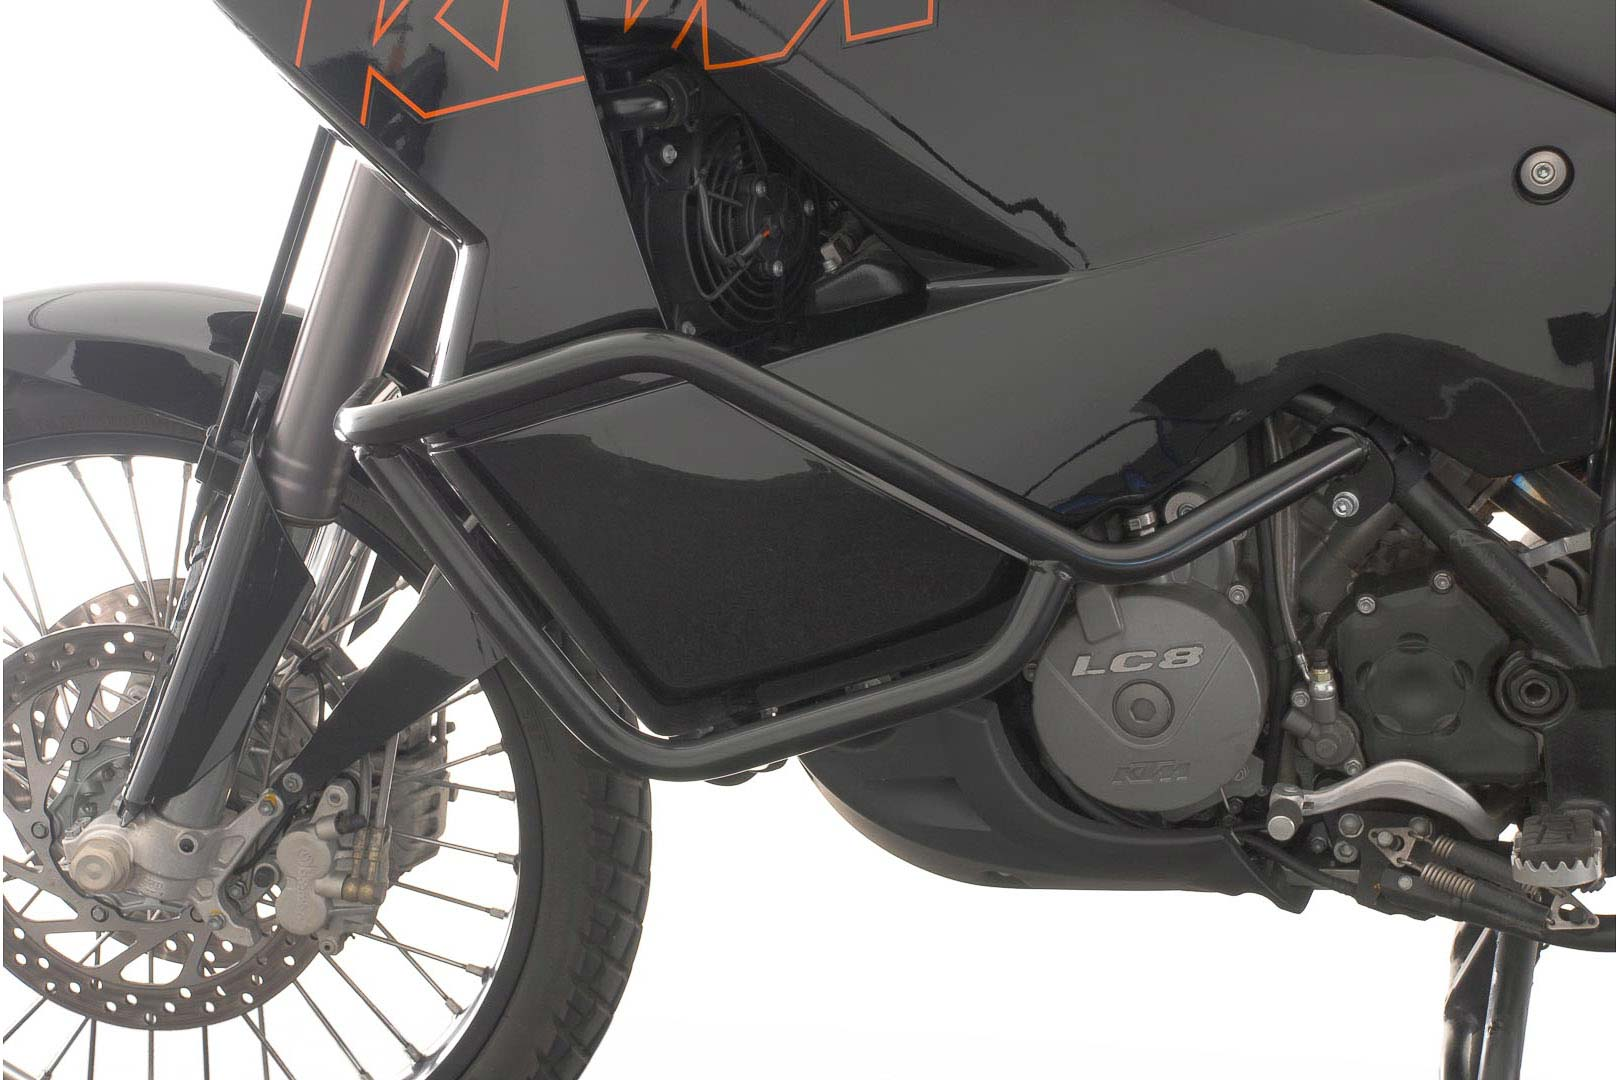 SW-Motech Moottorinsuojarauta KTM LC8 950/990 Adventure musta